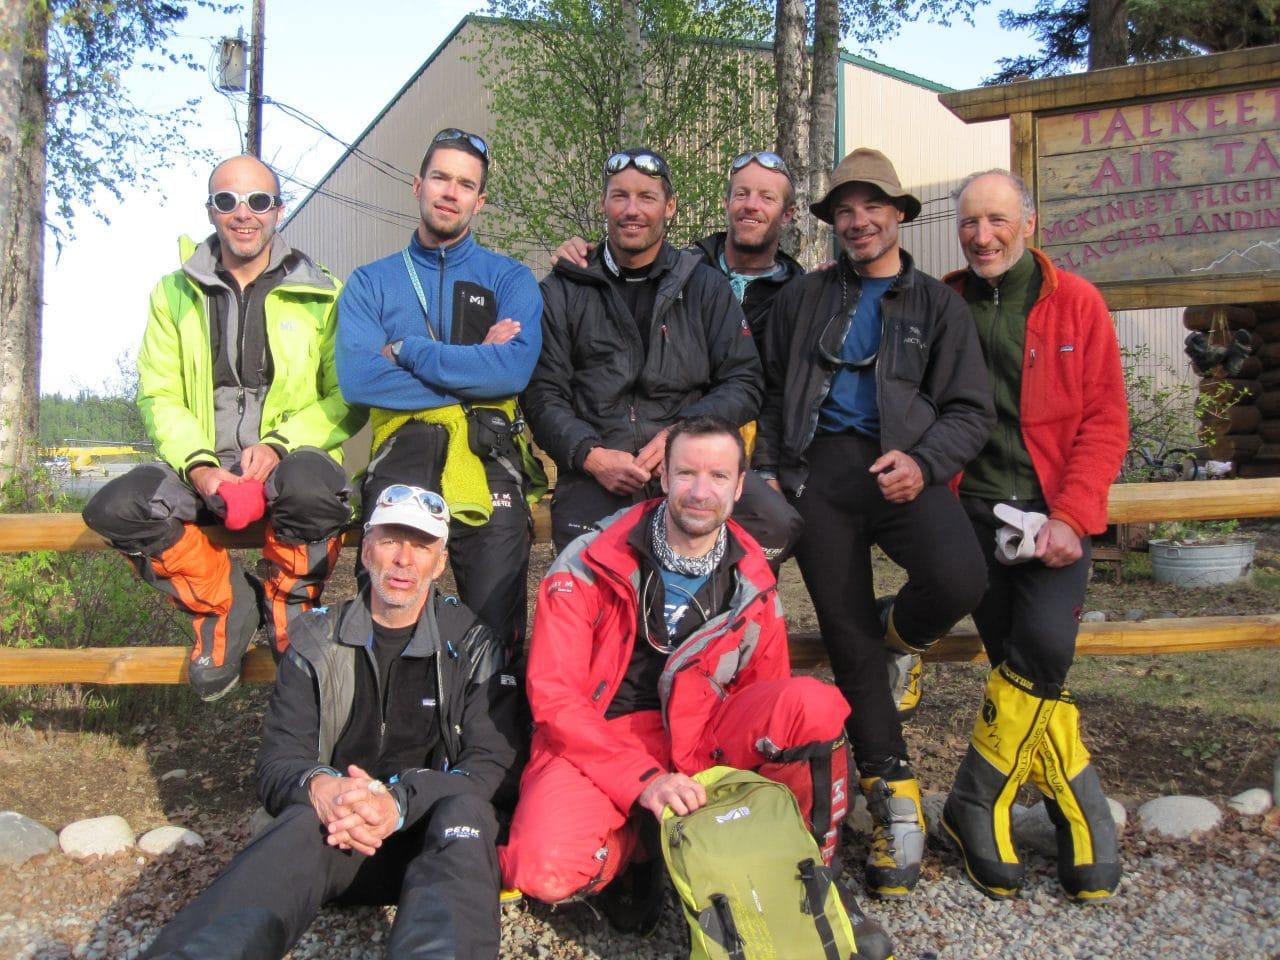 Helyum_Xavier-Carrard_Guide-de-montagne_Expedition_Alaska_Denali_Equipe-au-sommet